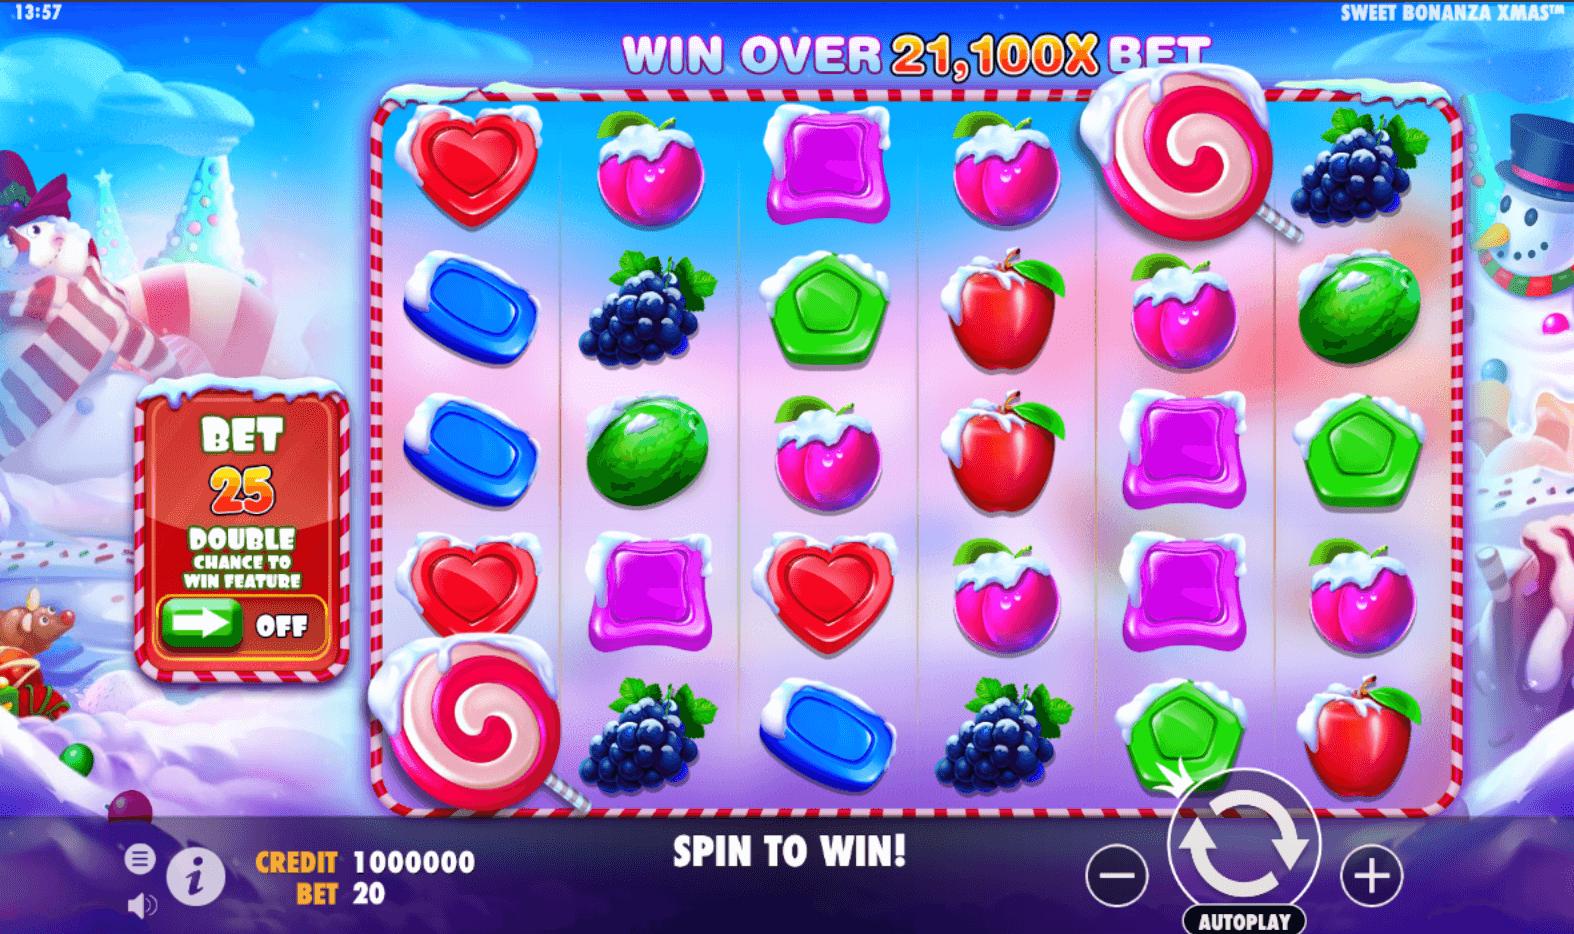 Screenshot from Sweet Bonanza Xmas Pragmatic Play slot